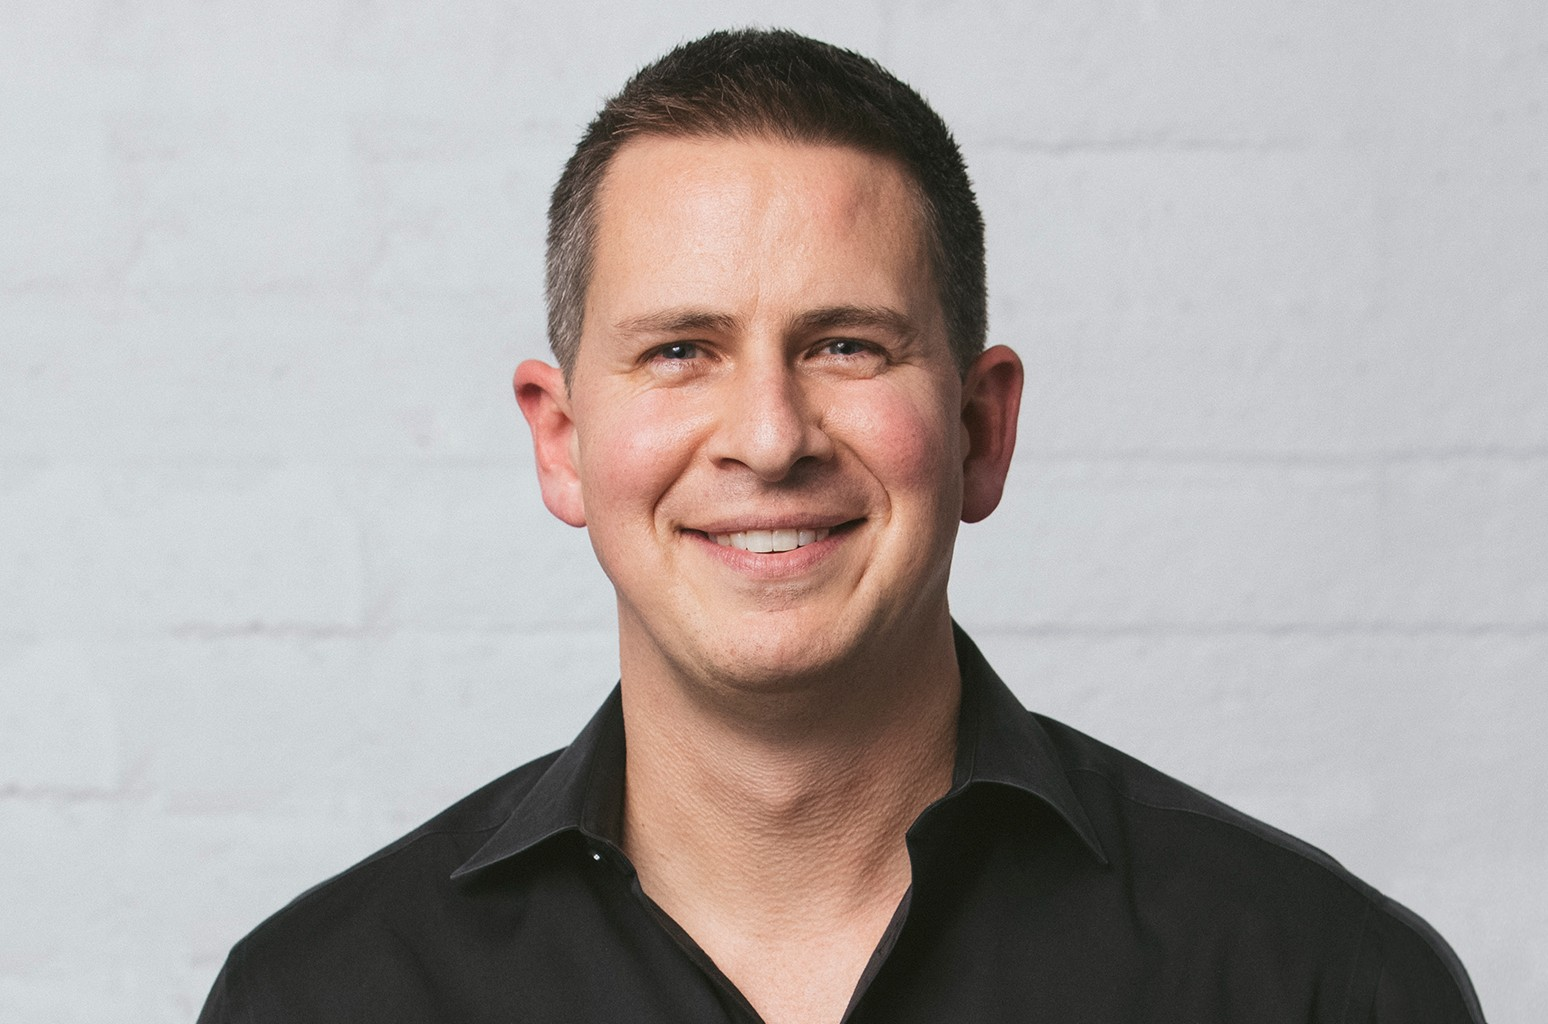 Patrick Spence, CEO of Sonos